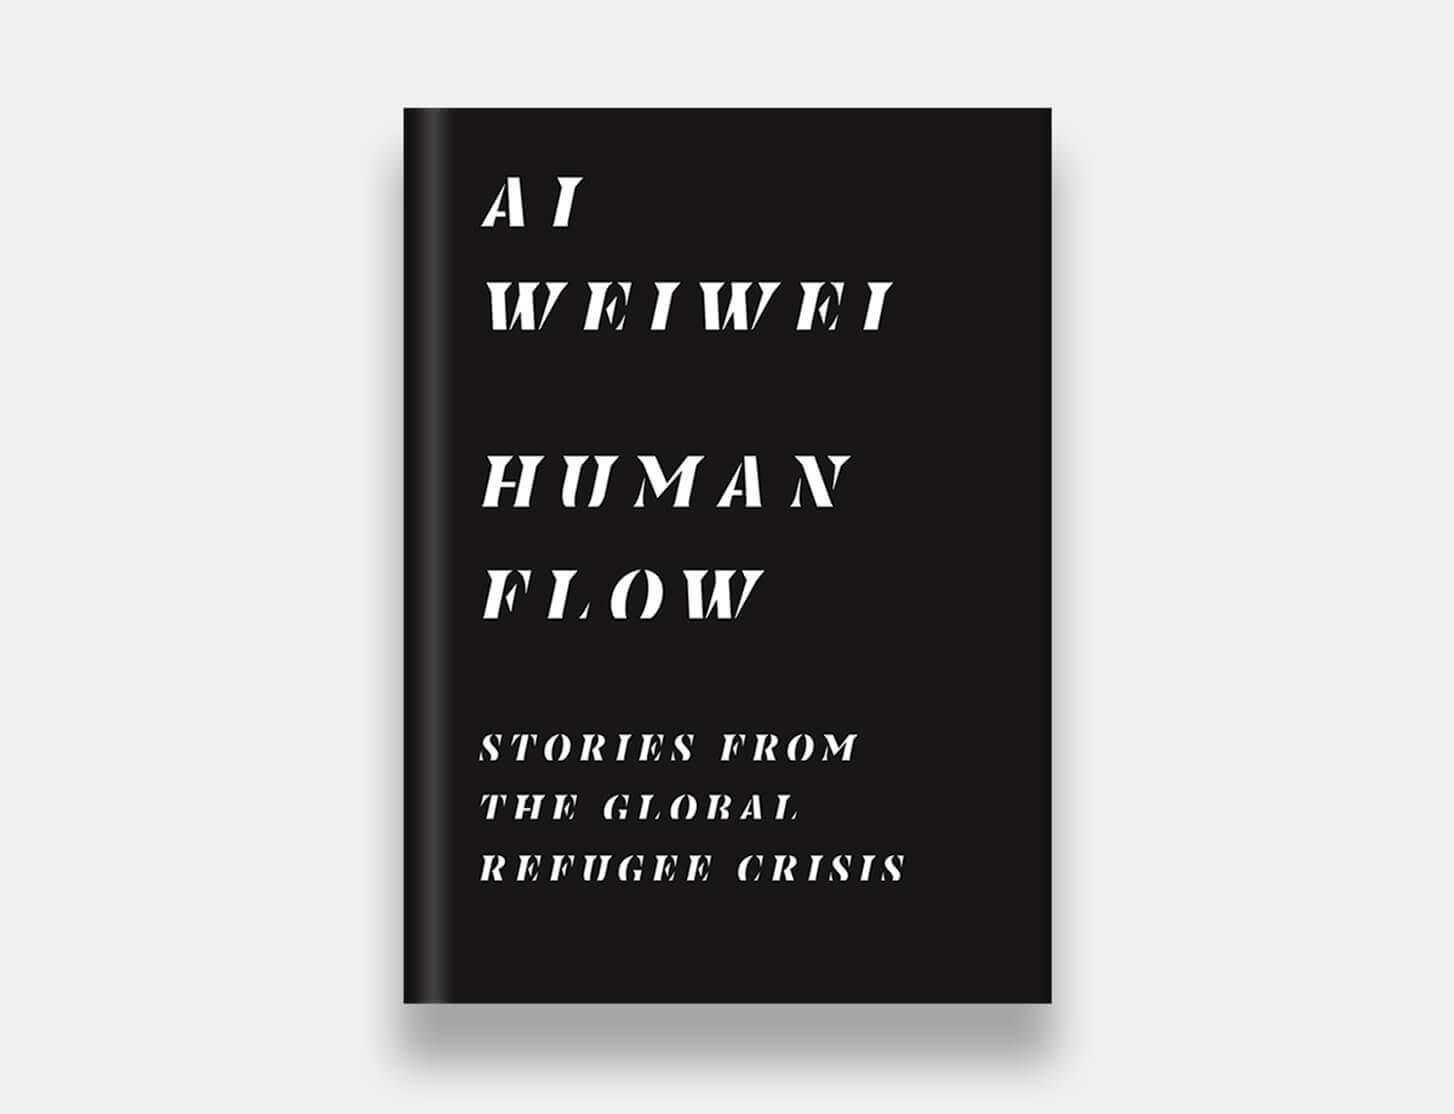 Ai Weiwei's 'Human Flow' publication now available